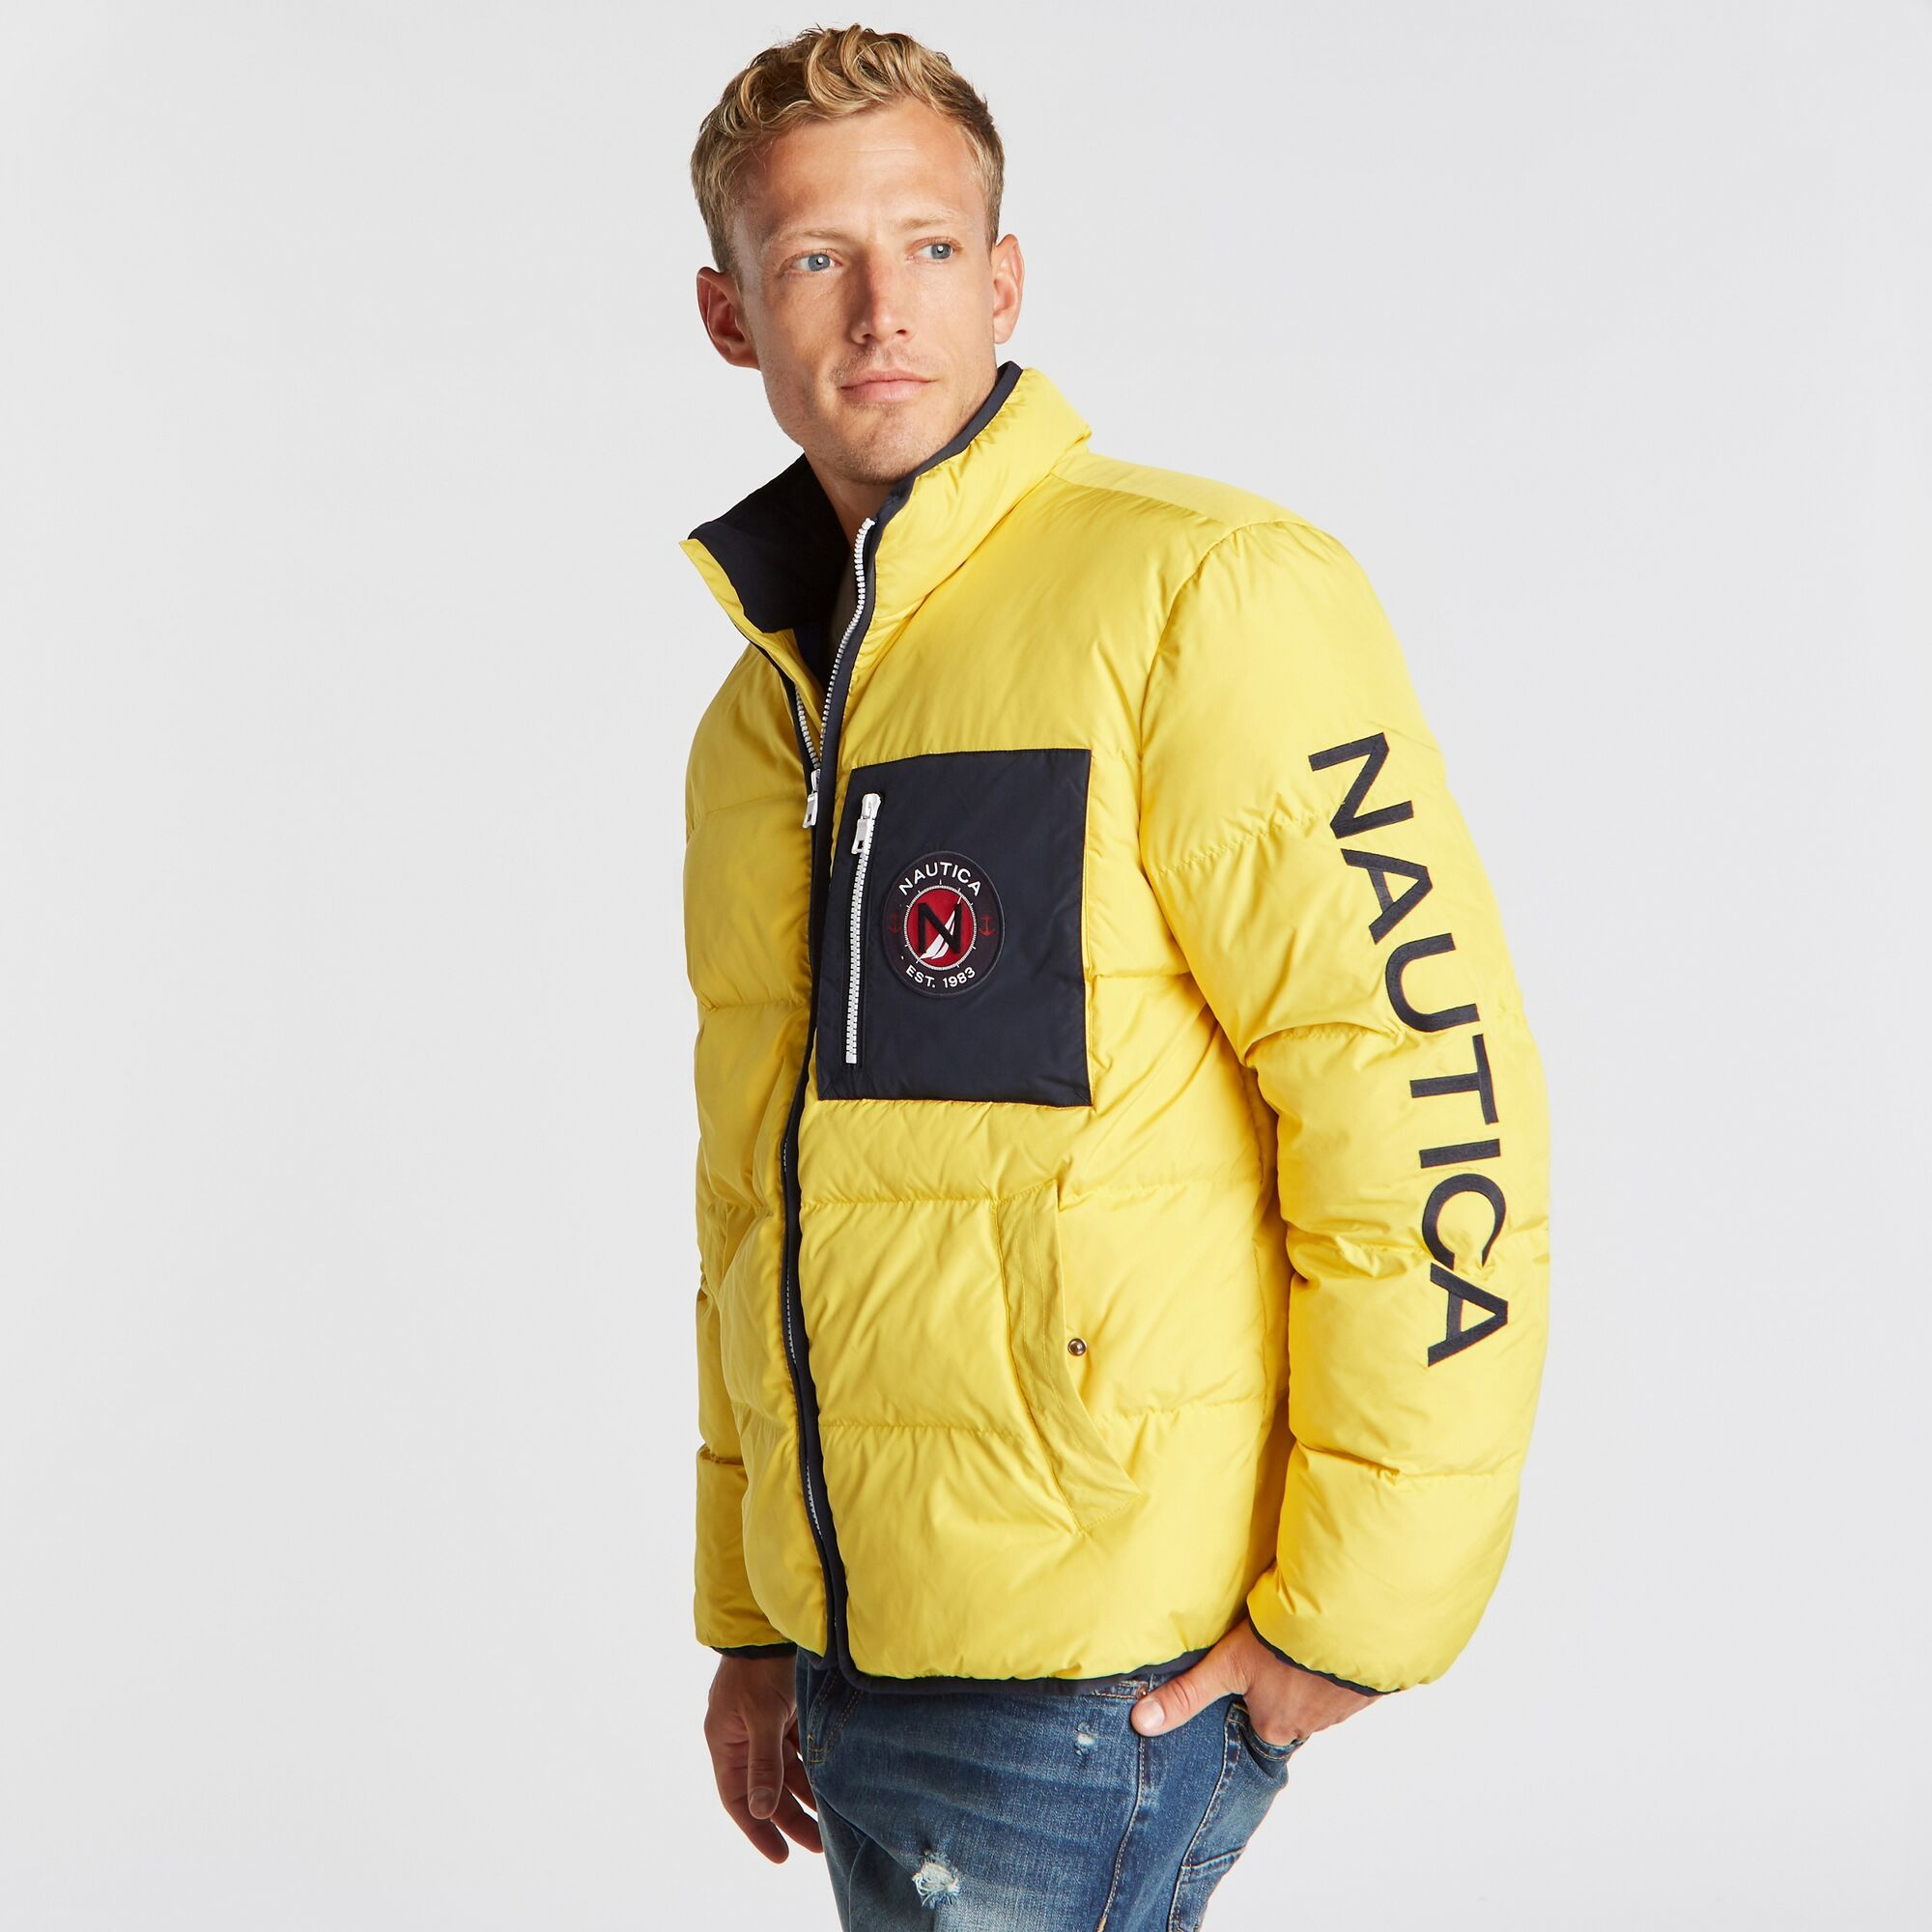 Nautica Men S Puffer Jacket With Tempasphere Buoy Yellow Mens Puffer Jacket Jackets Warm Puffer Jackets [ 2000 x 2000 Pixel ]